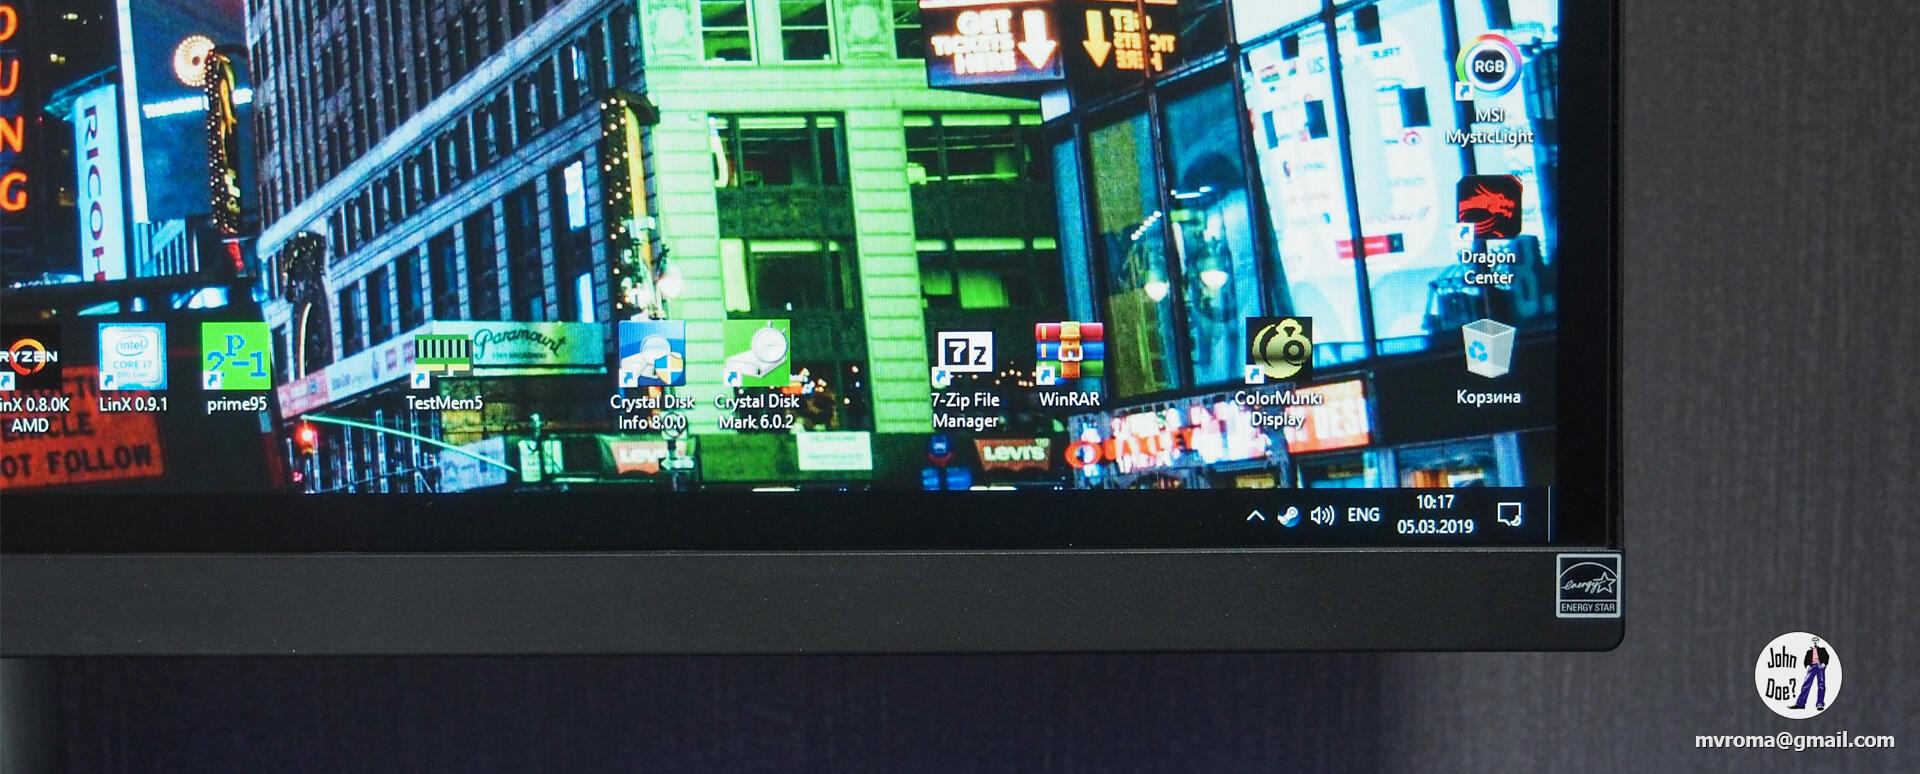 Periferiya - Obzor LG 29WK600-W. Nedorogoy UltraWide IPS-monitor c HDR